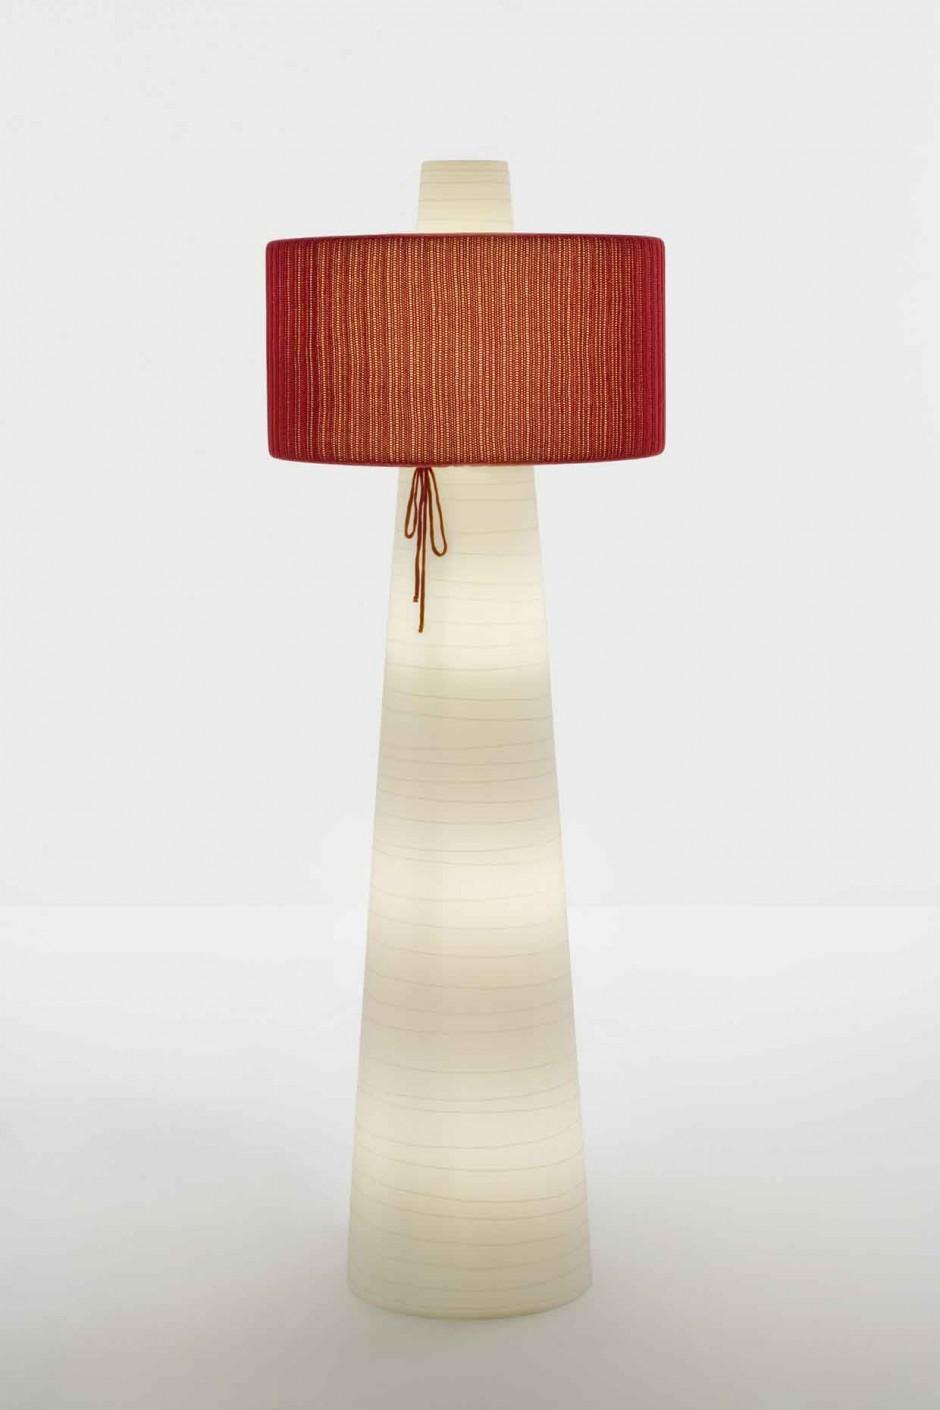 UP-Floor-Lamp-Lamps-Design Creative 10 Ideas for Residential Lighting